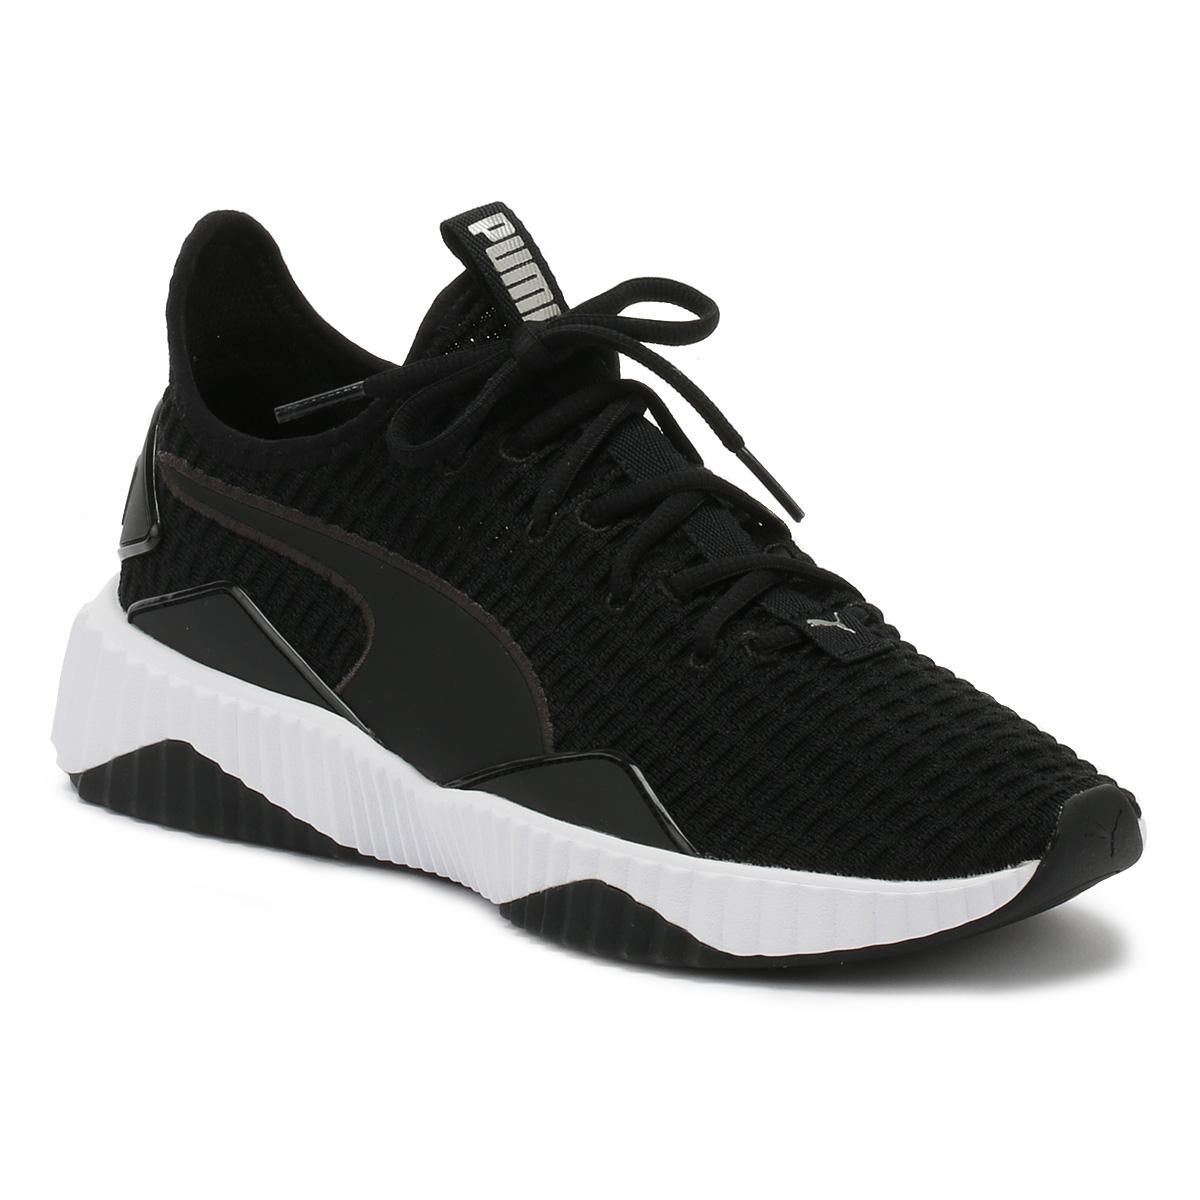 edbaa1ac Womens Selena Gomez Black / Black Defy Sneakers